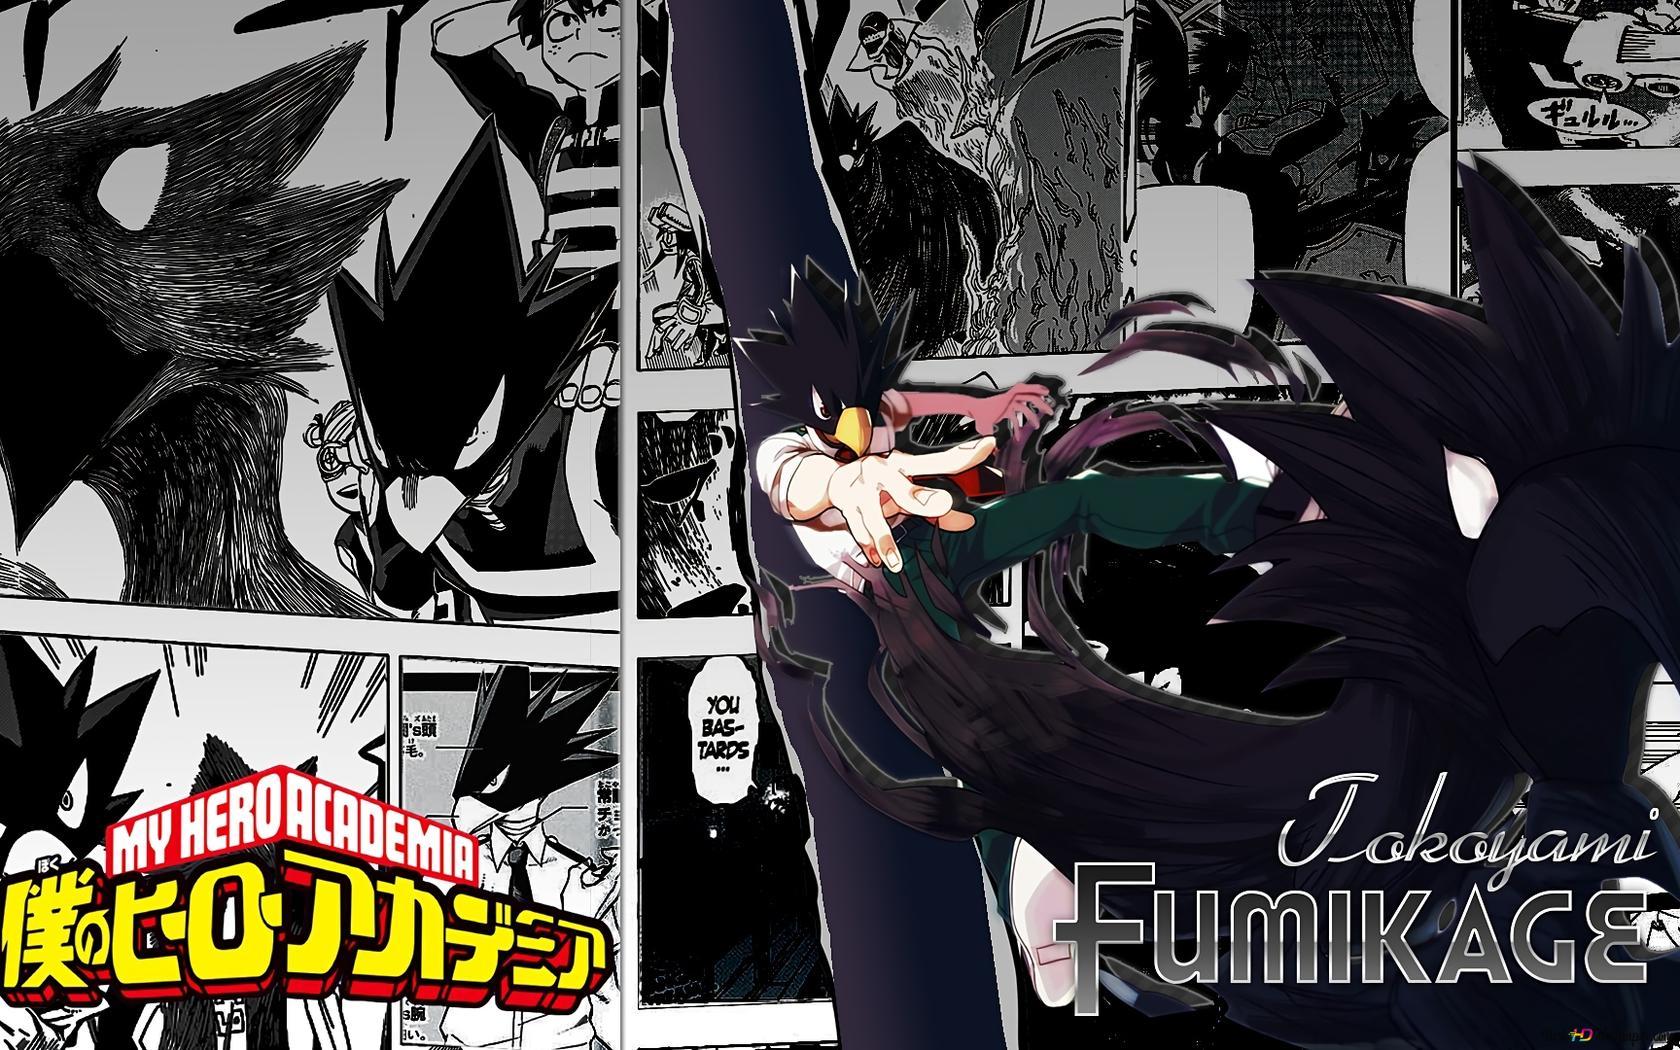 My Hero Academia Fumikage Tokoyami Hd Wallpaper Download